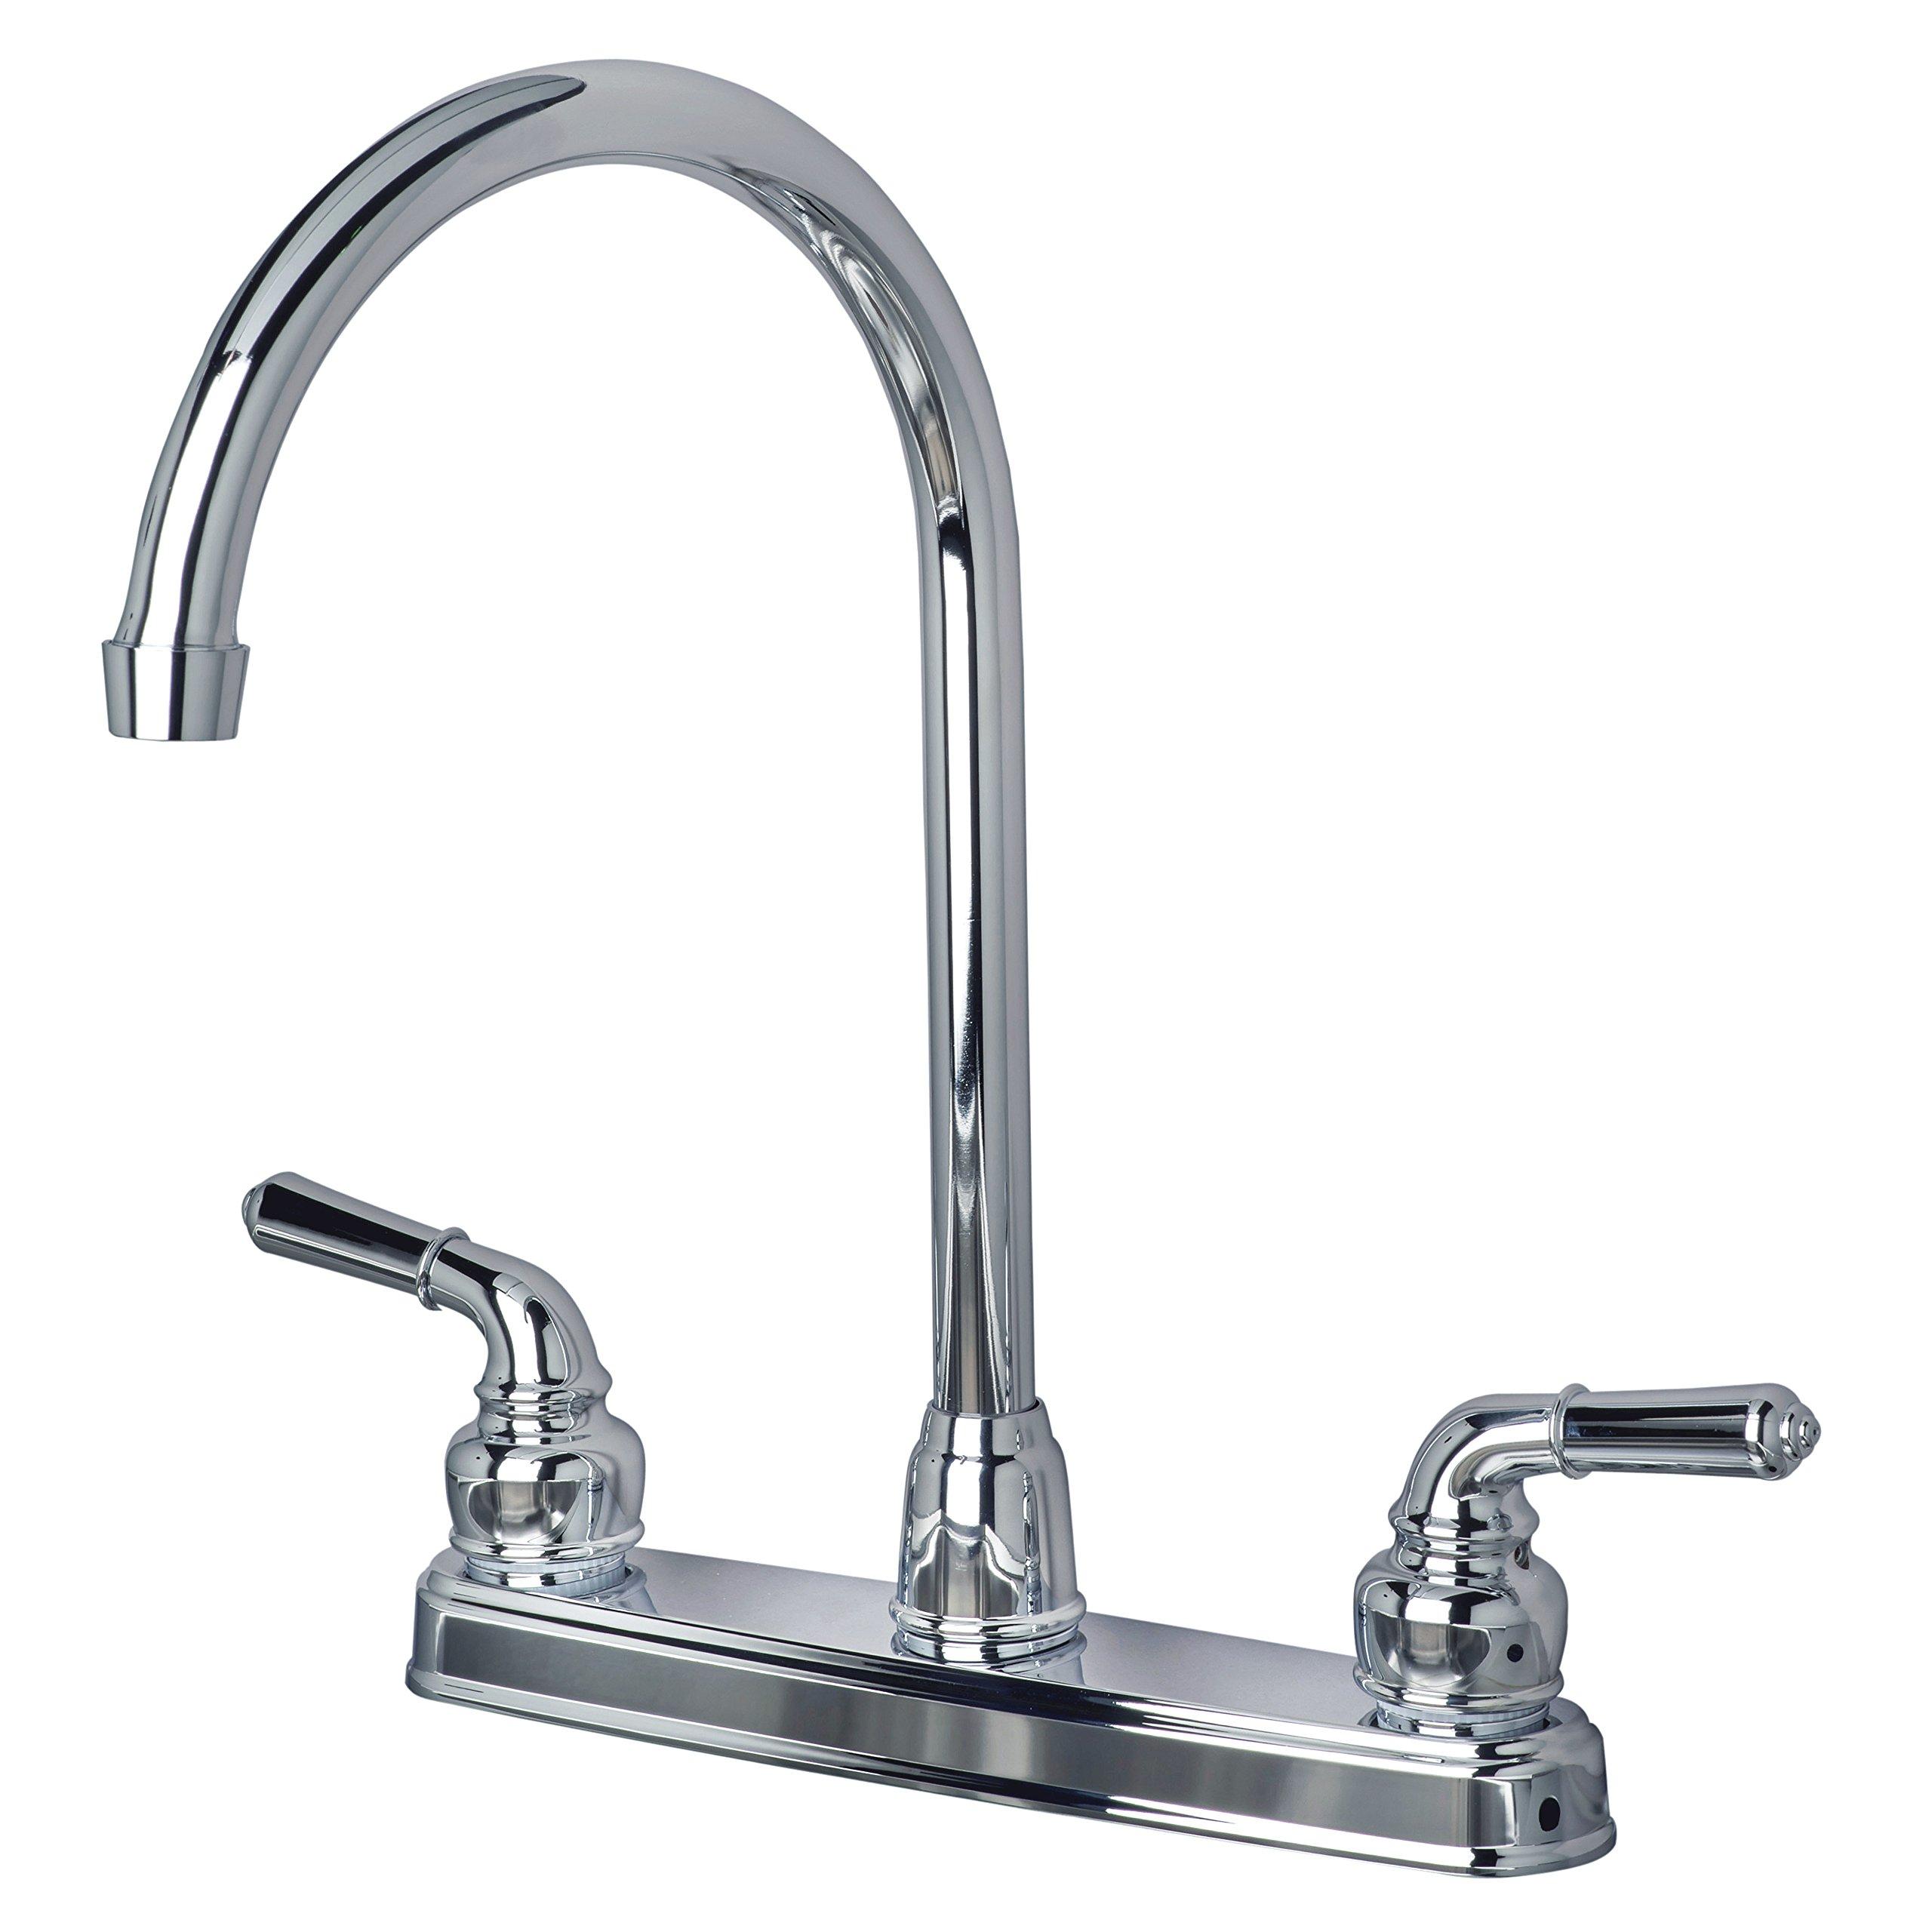 Builders Shoppe 1201CP RV Mobile Home Non-Metallic High Arc Swivel Kitchen Sink Faucet Chrome Finish